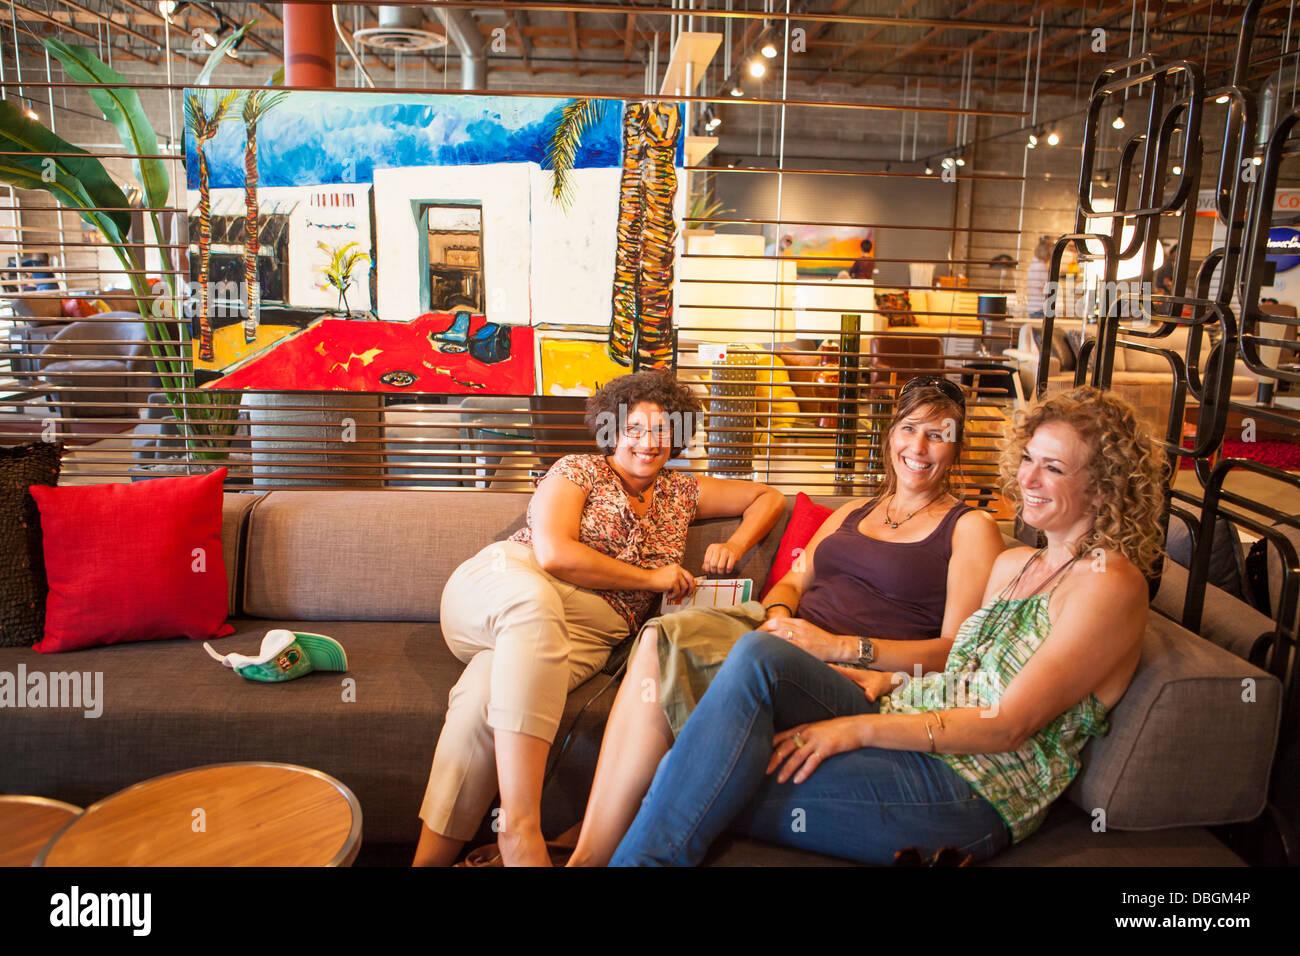 mayor Helene Schneider with friends at MichaelKate Interiors and Gallery, The Funk Zone, Santa Barbara, California - Stock Image